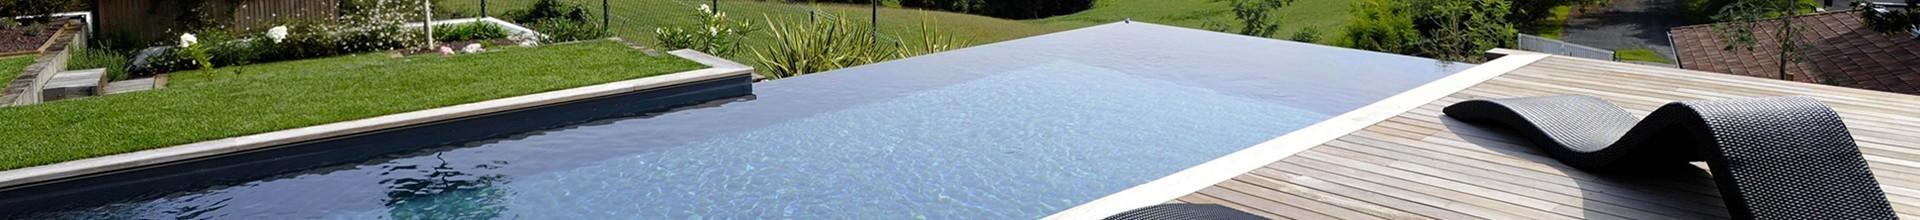 Luxembourg conception conteneur piscine coque sur mesure Differdange